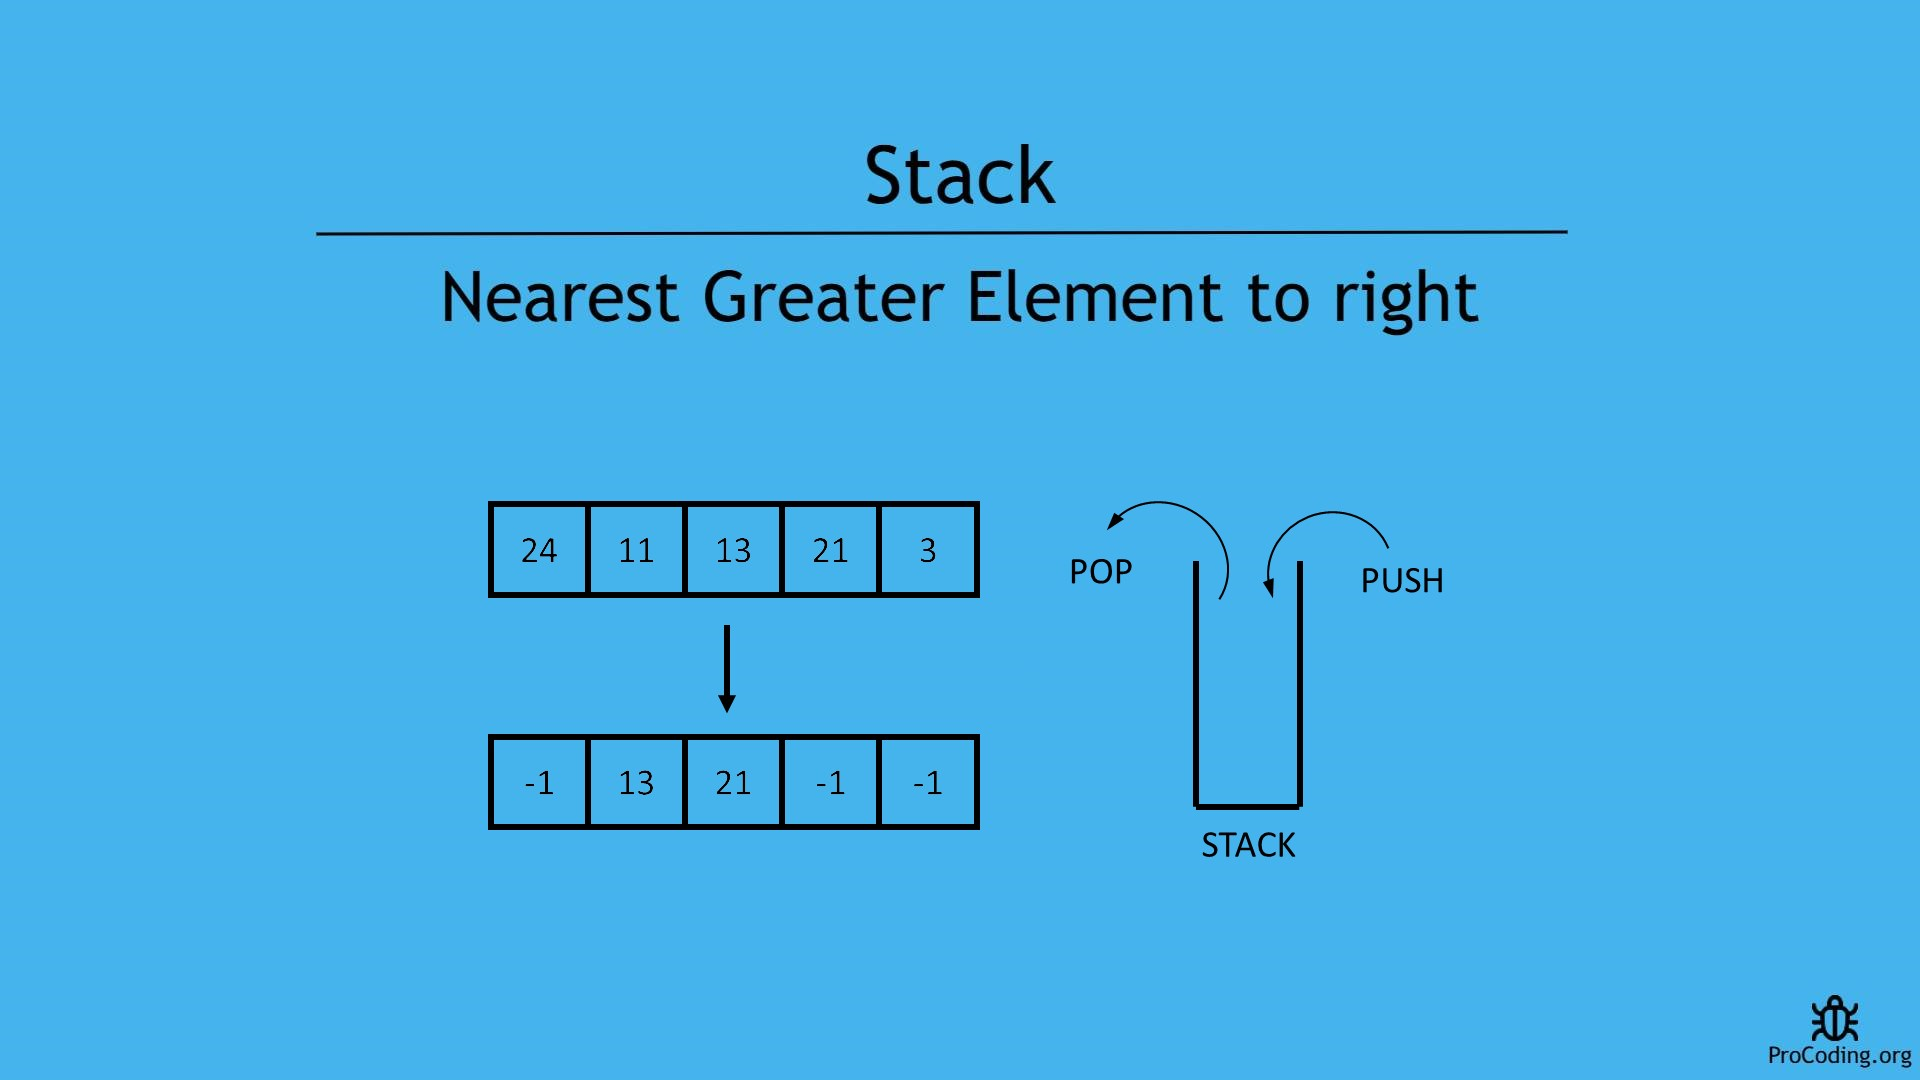 Nearest greatest element in stack